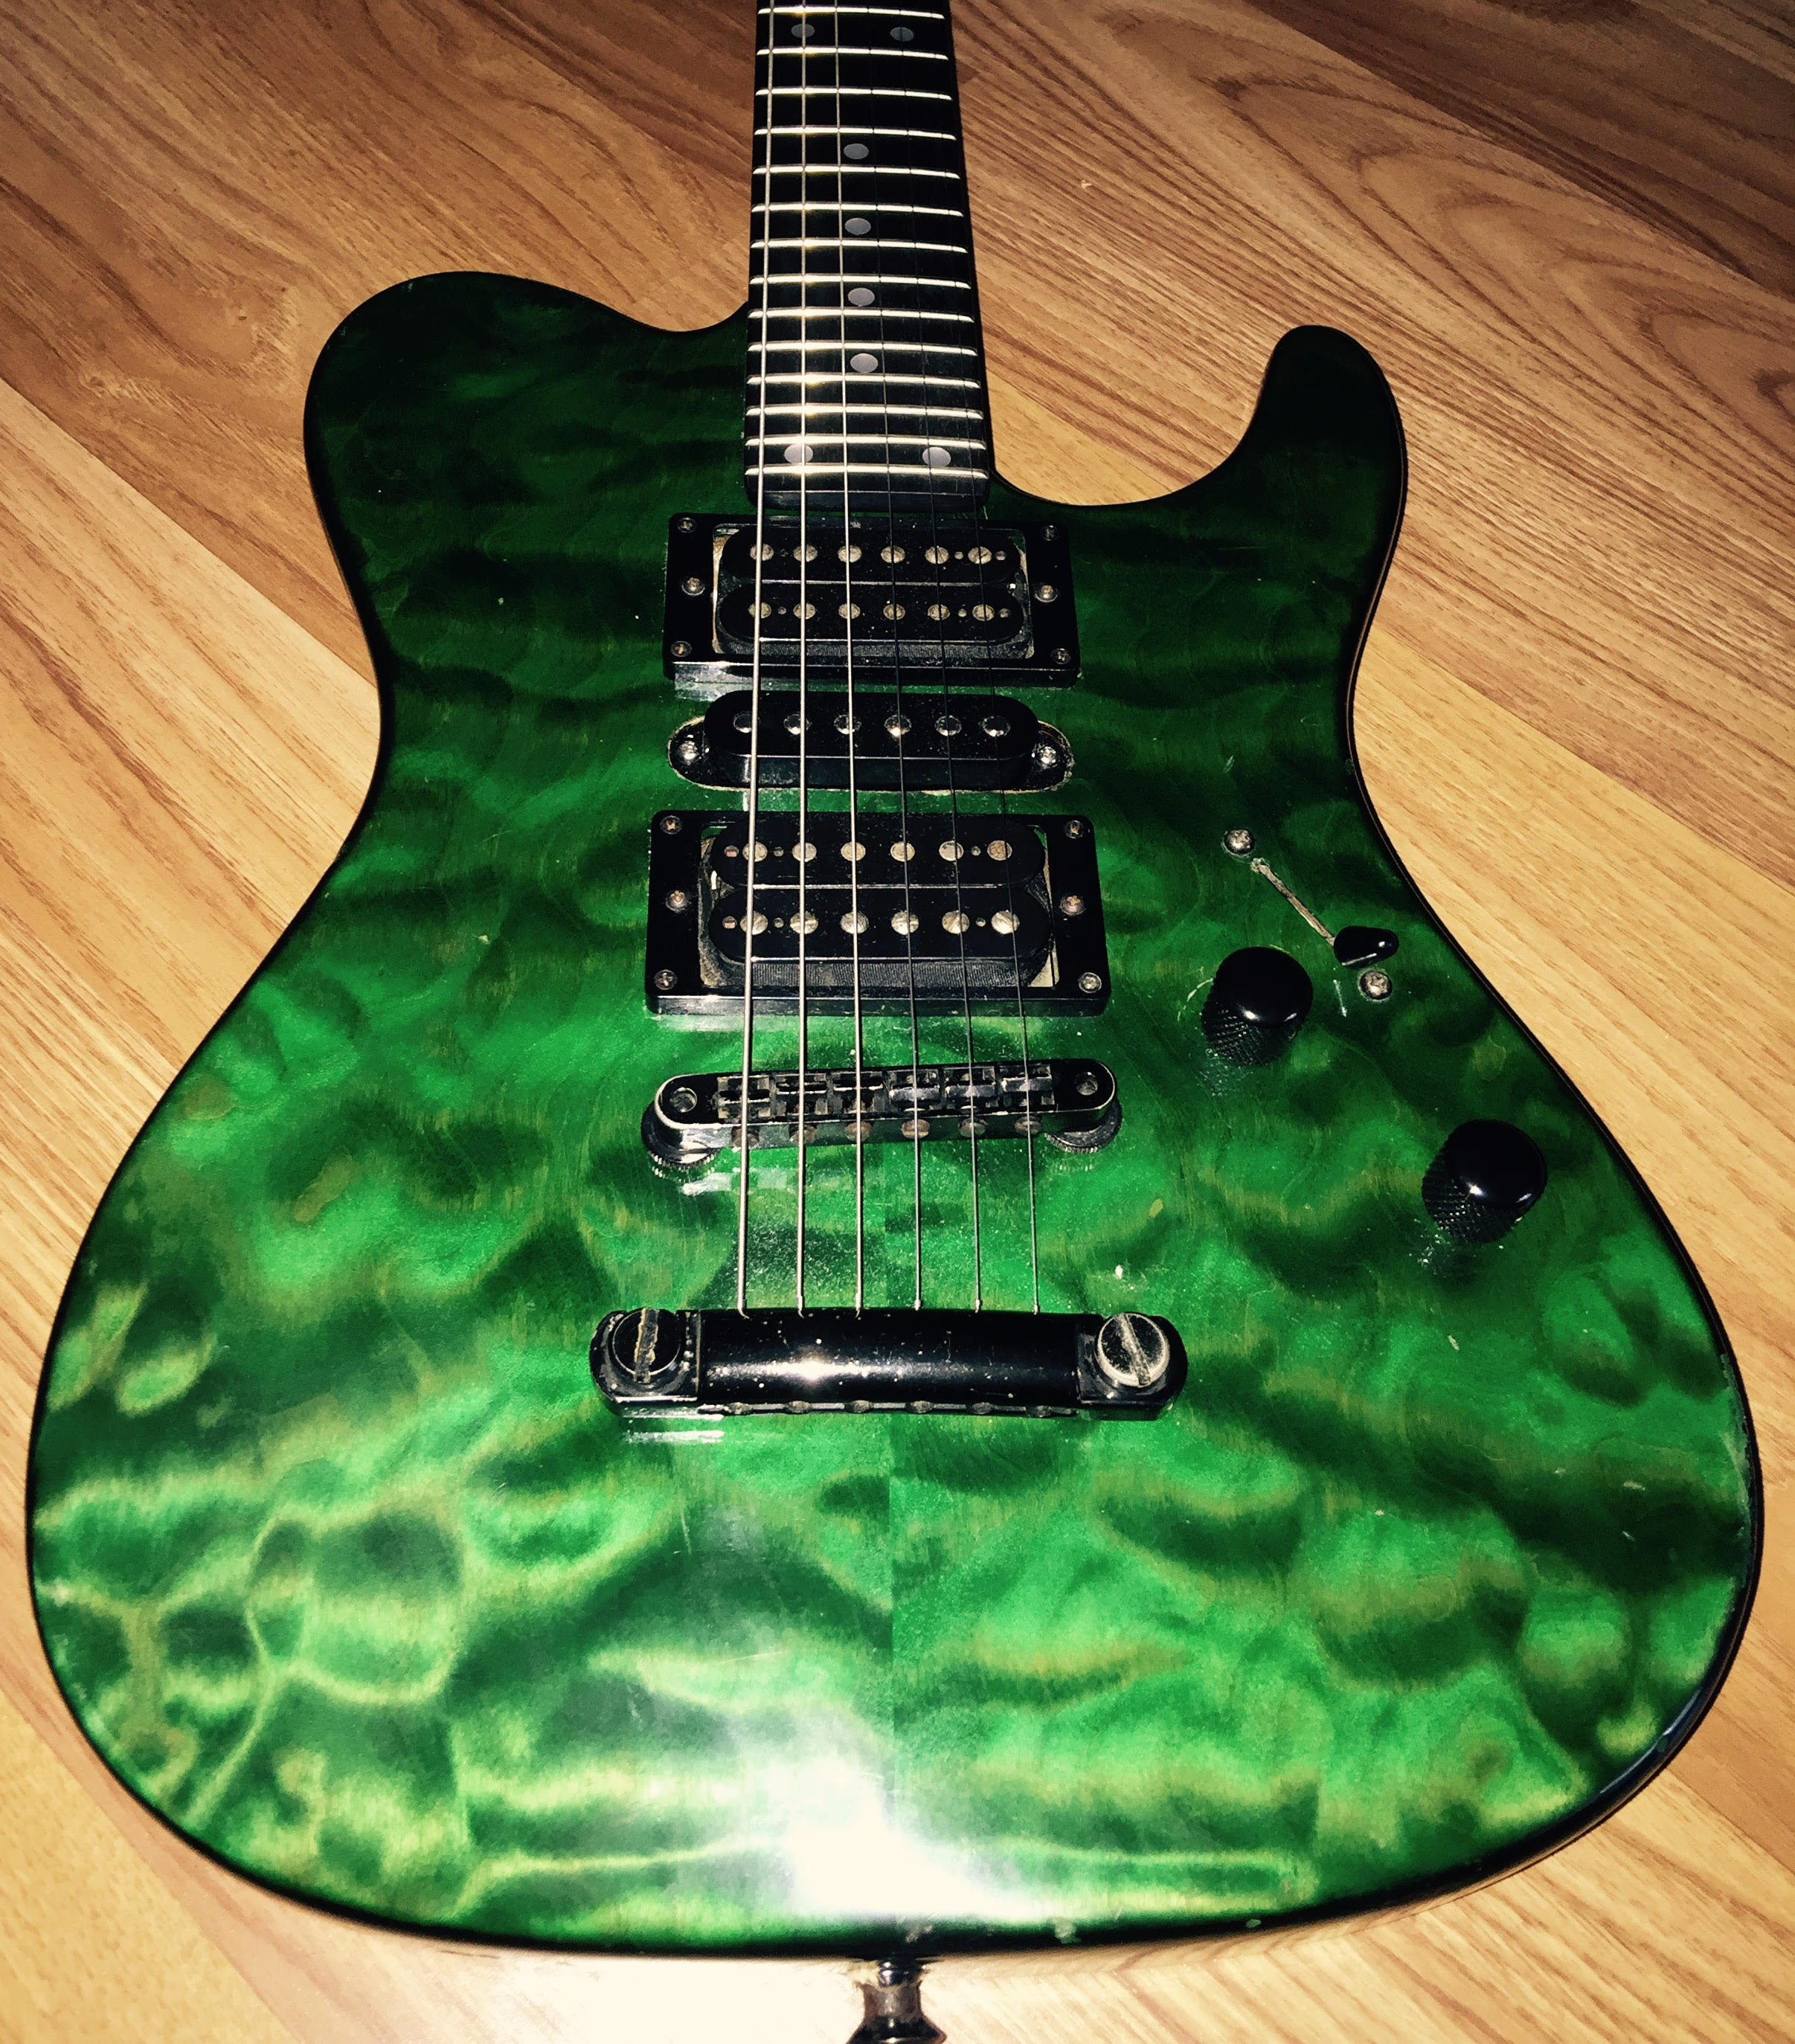 va02065 va custom pro added 8 8 17 t shape valley arts guitars. Black Bedroom Furniture Sets. Home Design Ideas